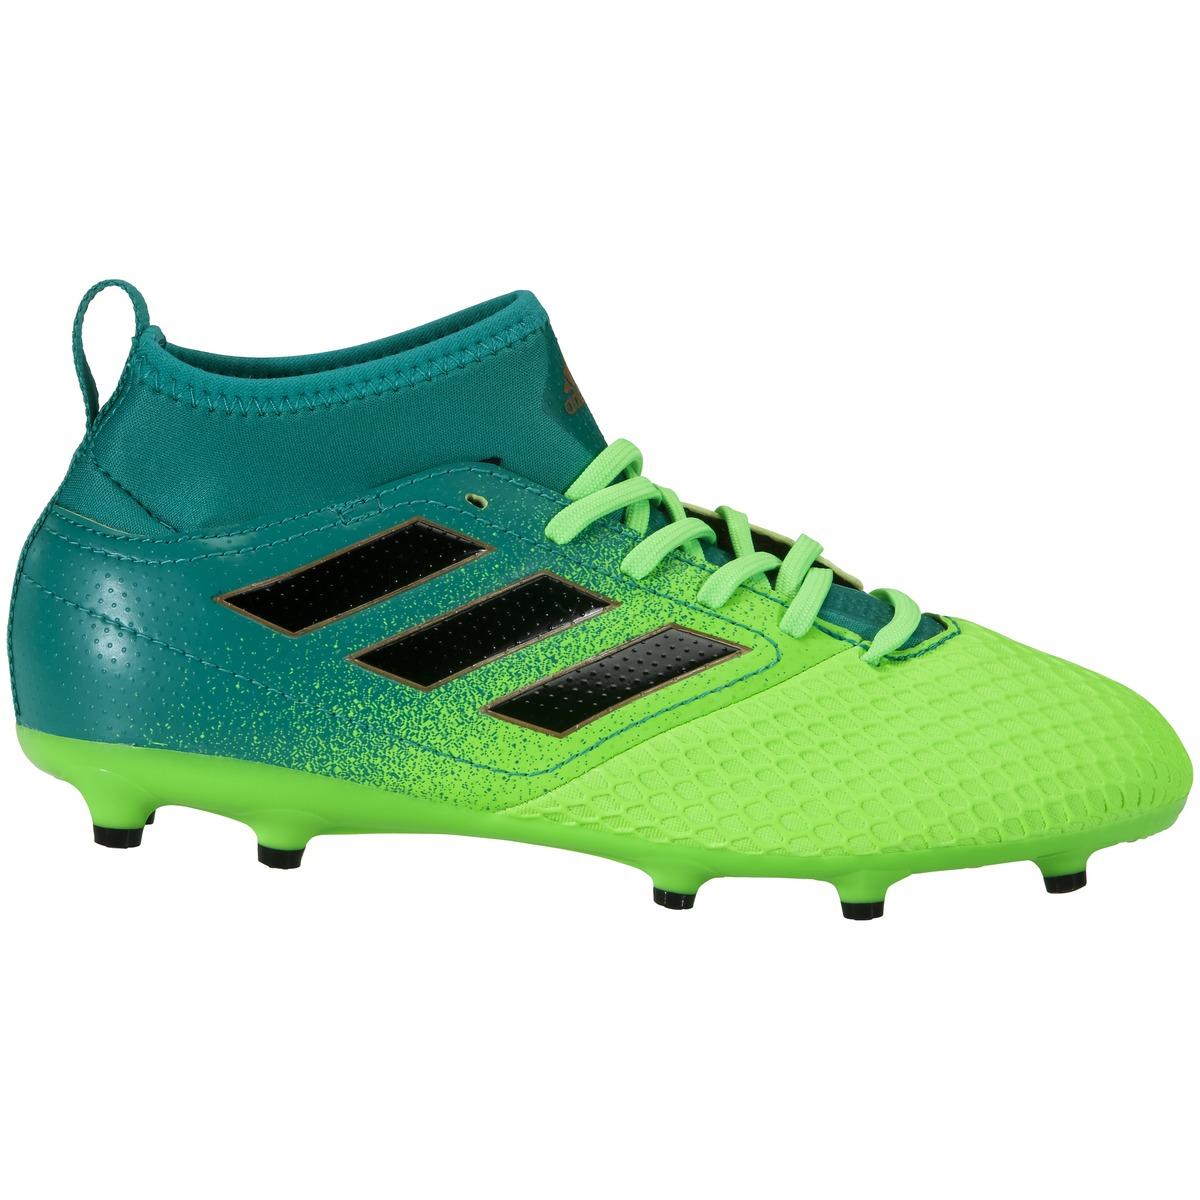 cdc864e5 Buy adidas ace tango 17.3 q4 futsalsko junior fotballsko . Shop ...